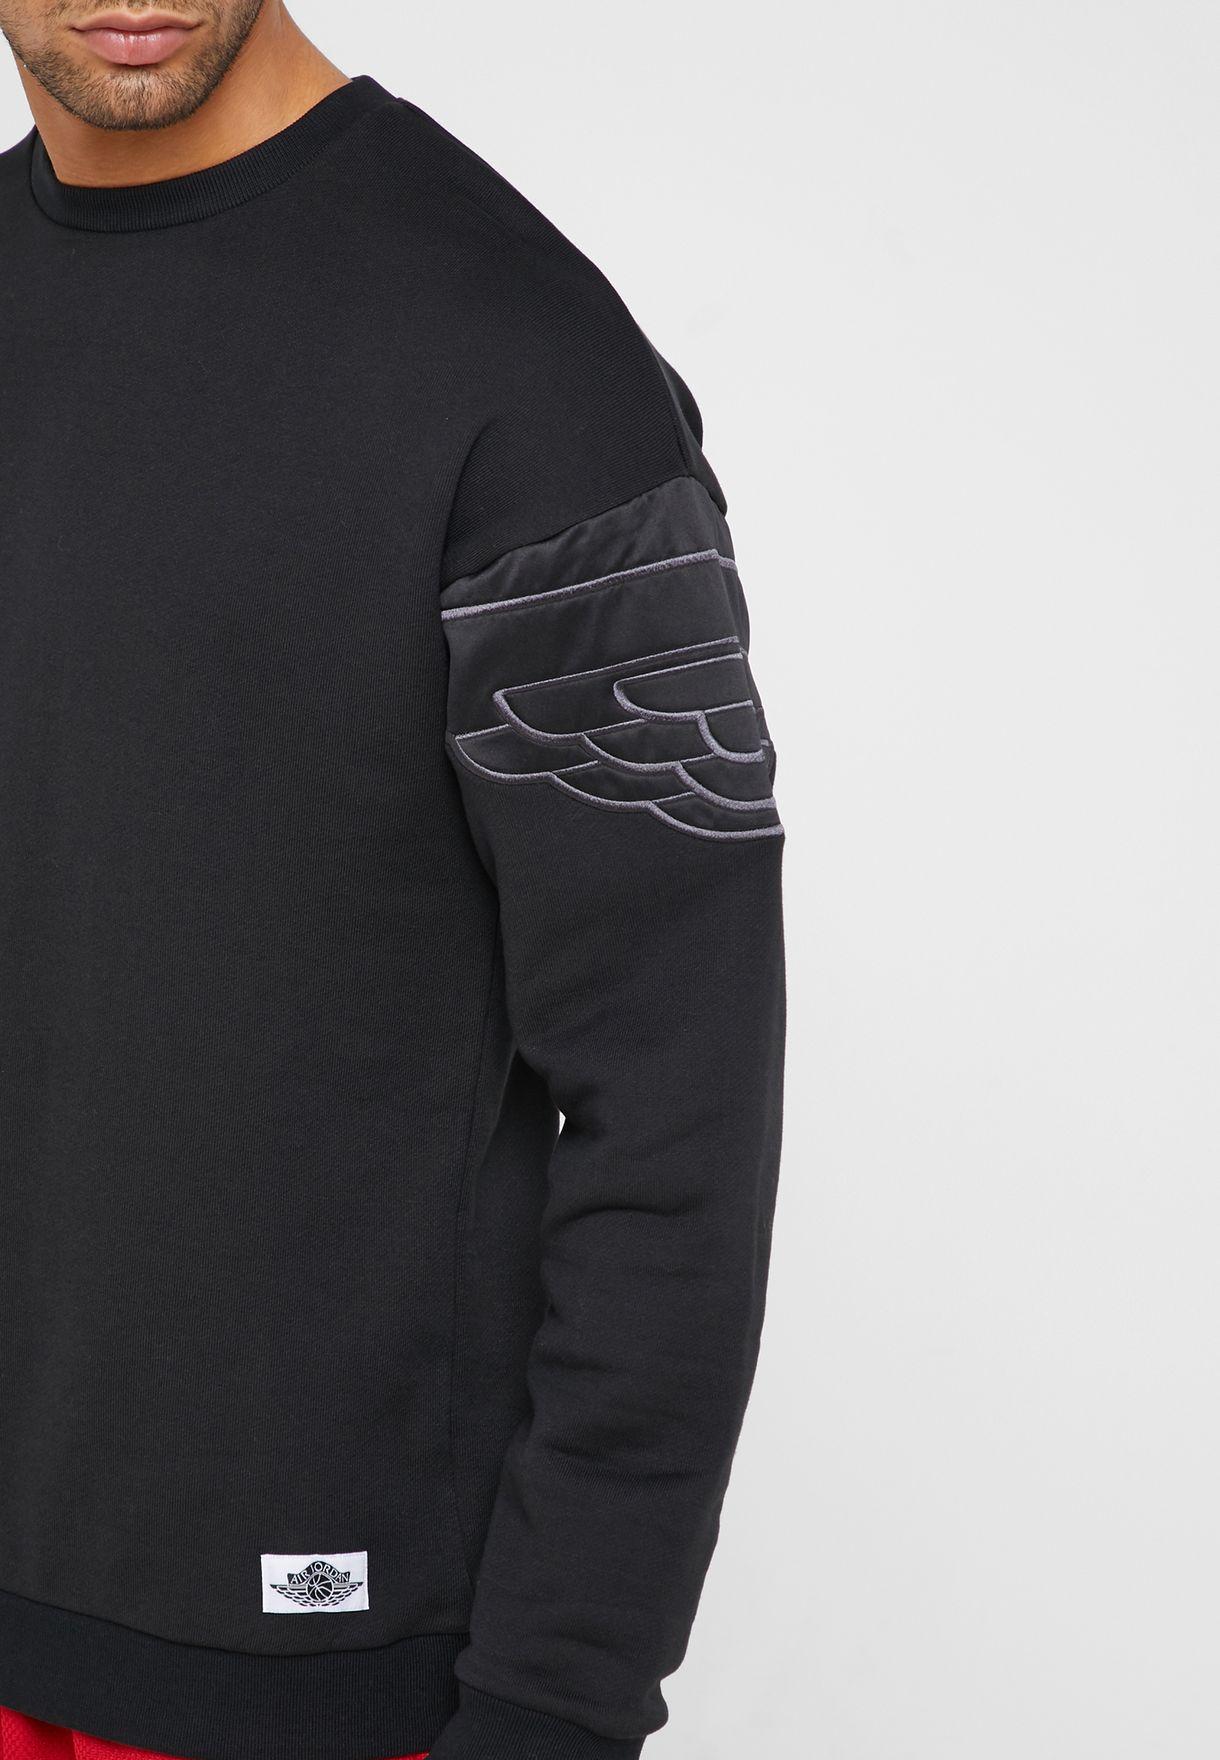 6343e19e0ec Shop Nike black Jordan Wings Classic Sweatshirt AO0426-010 for Men ...